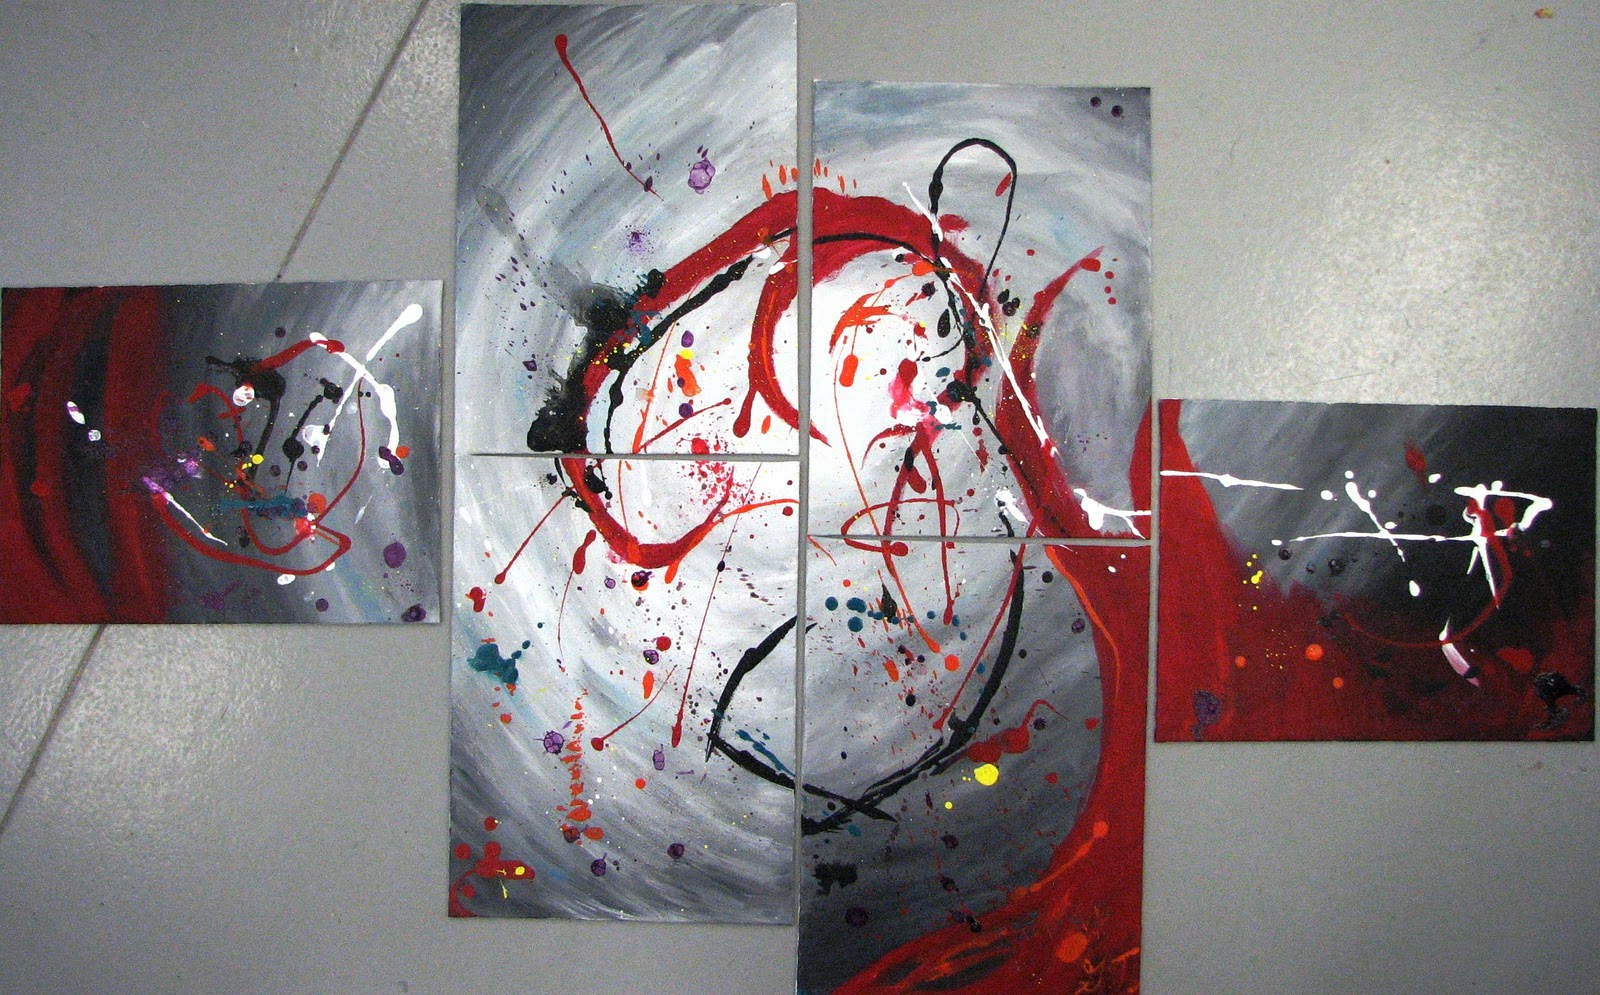 garrett u0026 39 s art